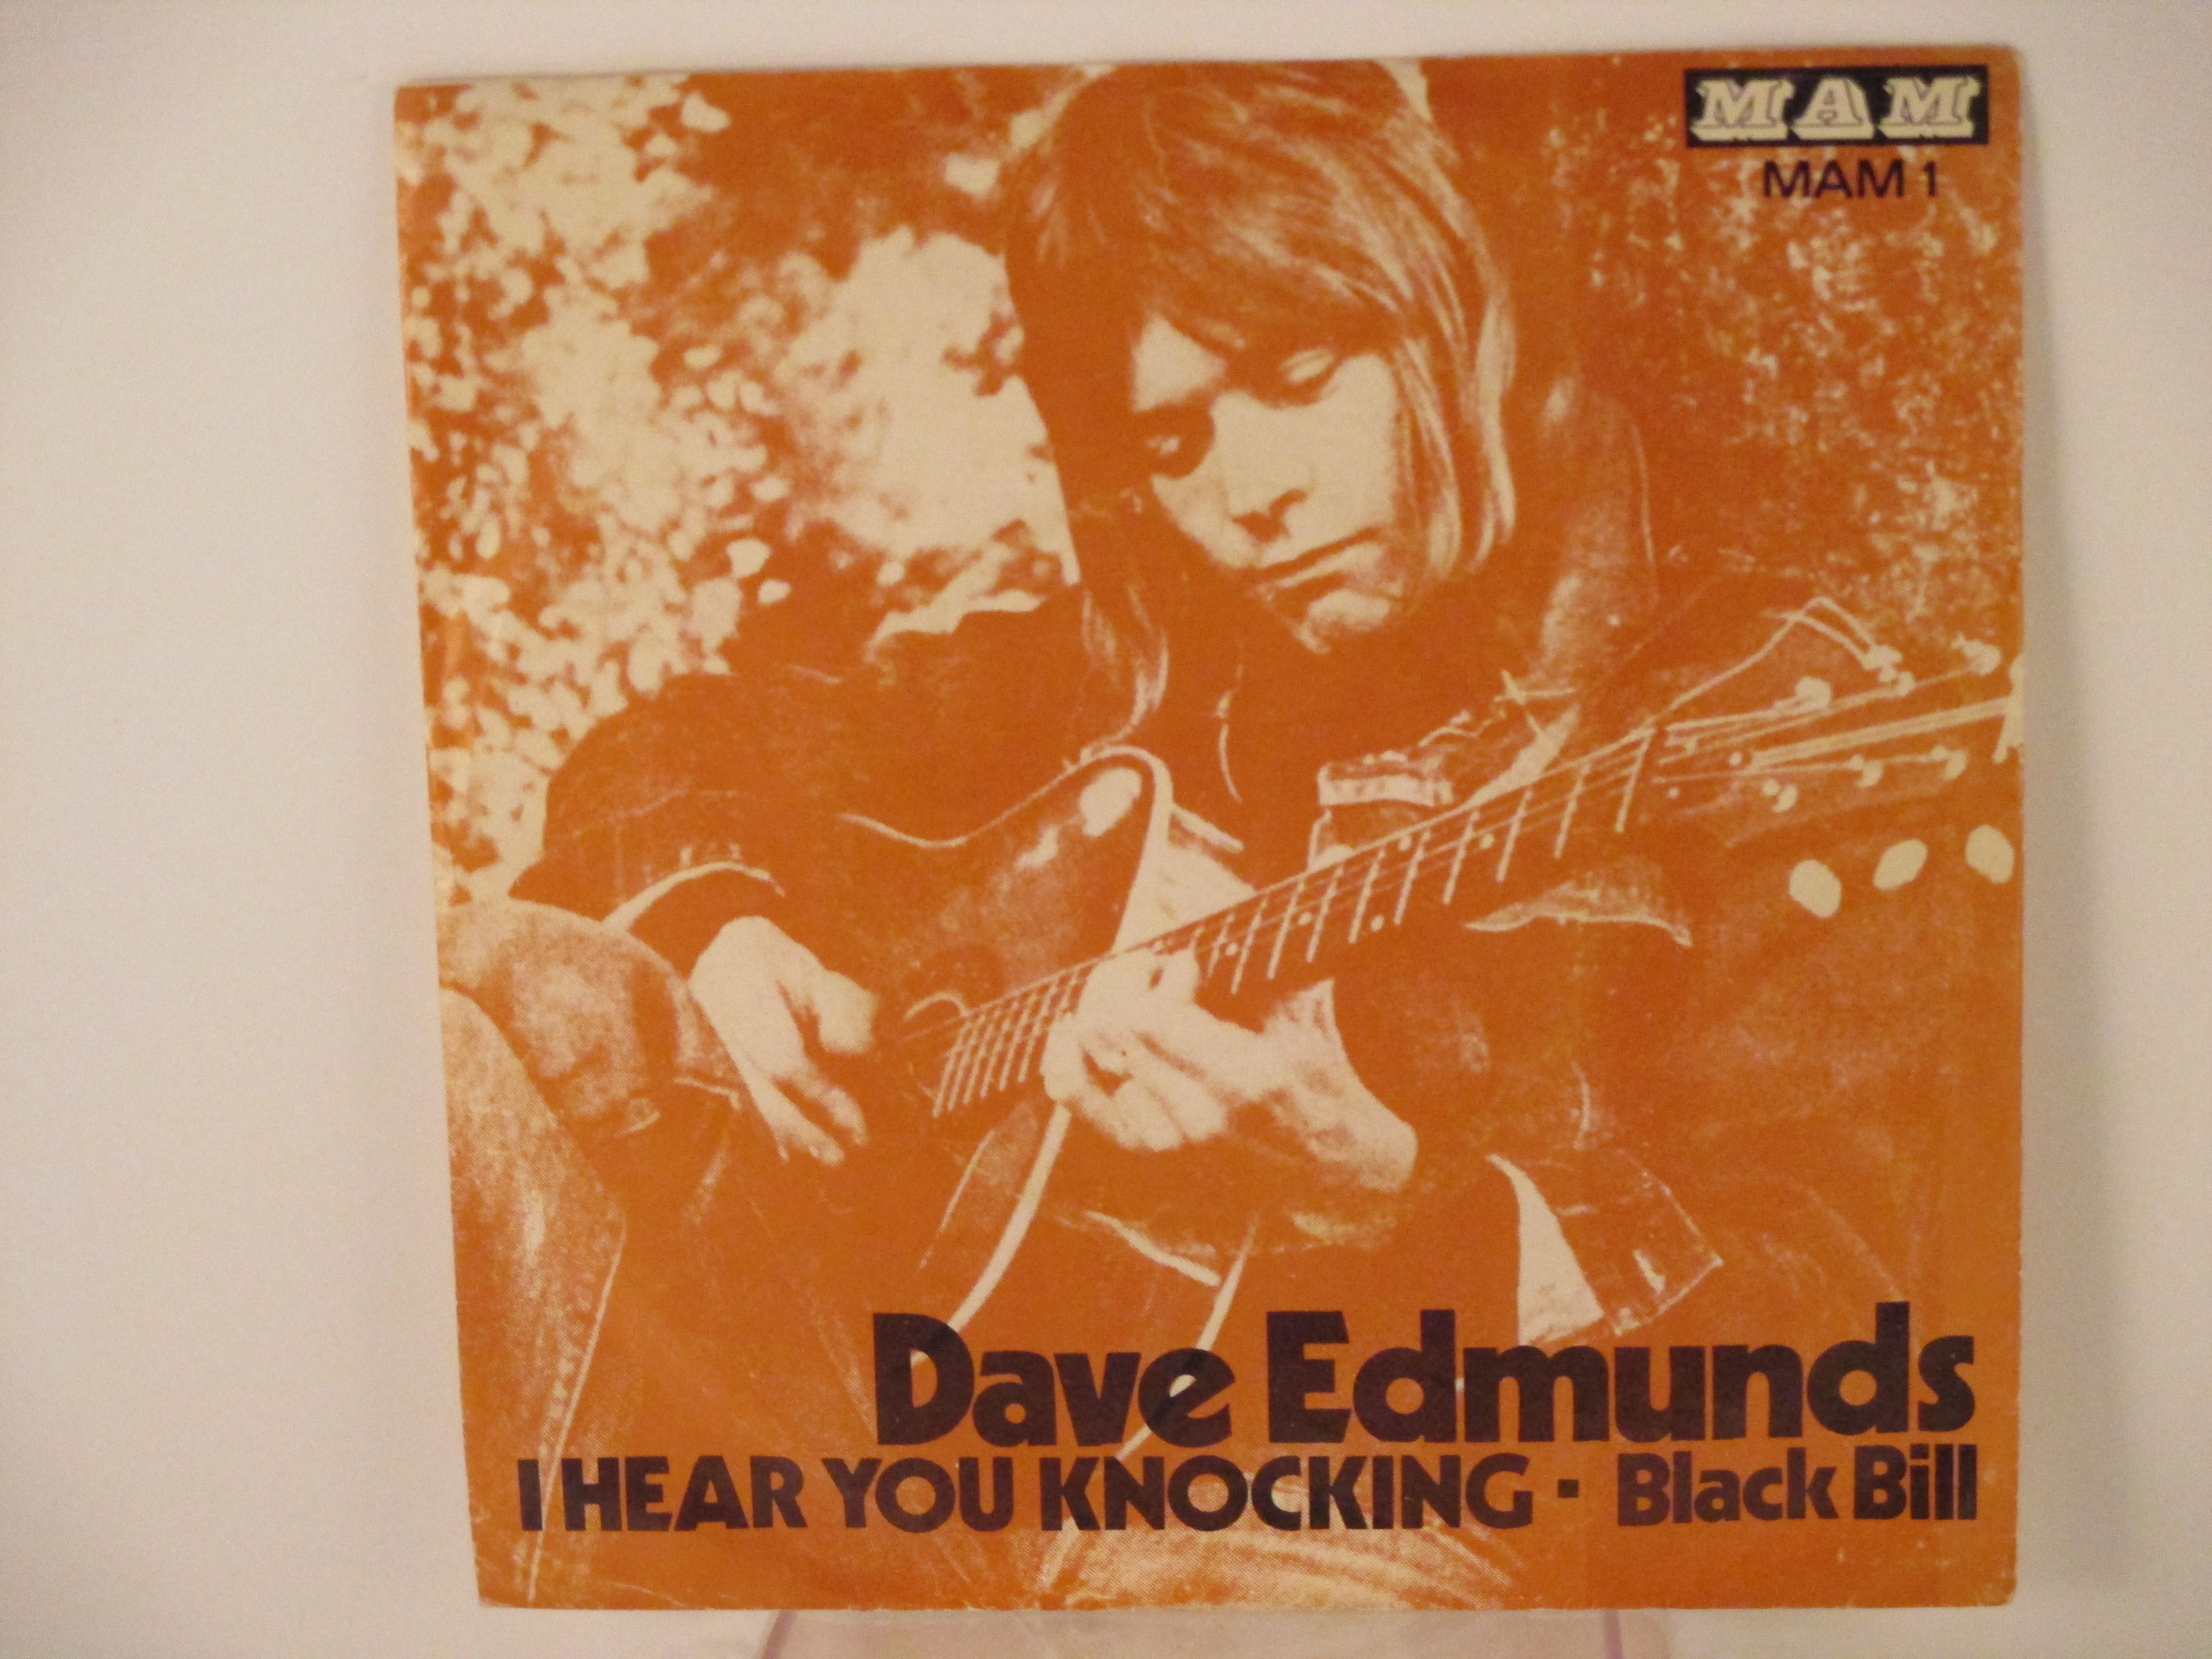 DAVE EDMUNDS : I hear you knocking / Black Bill